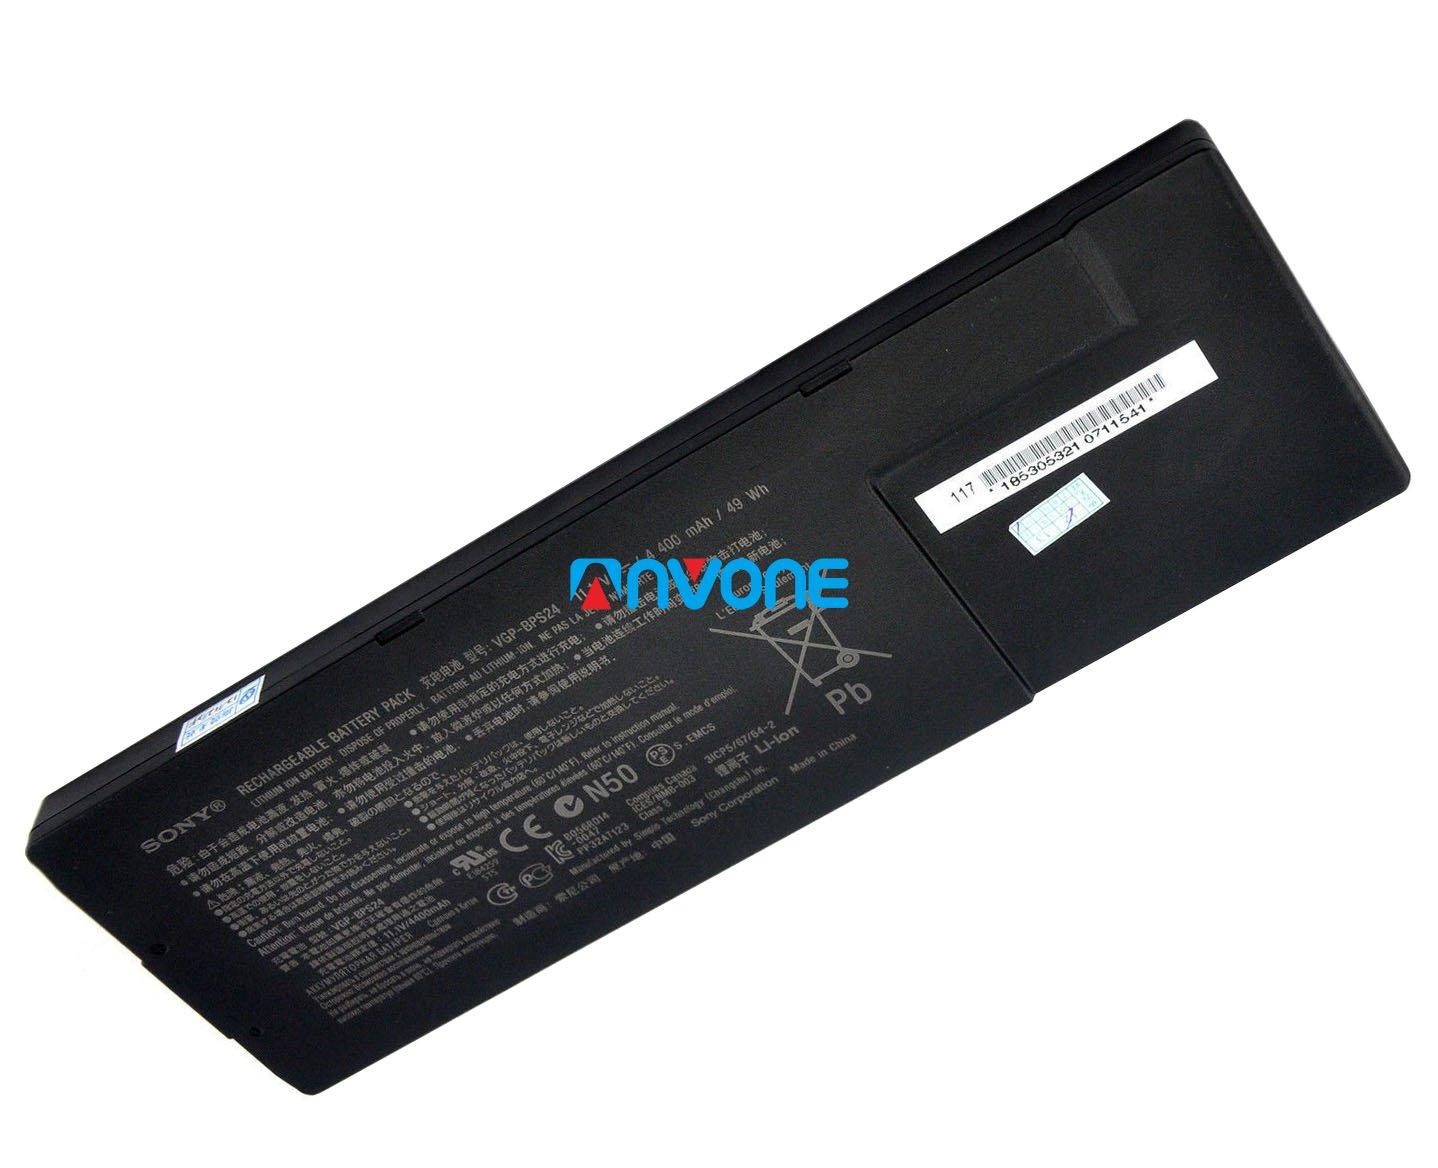 VGP-BPS24 Genuine Sony VAIO VPC-SD18EC/L VPC-SD18EC/P VPC-SD18EC/W VPC-SD19EC Battery